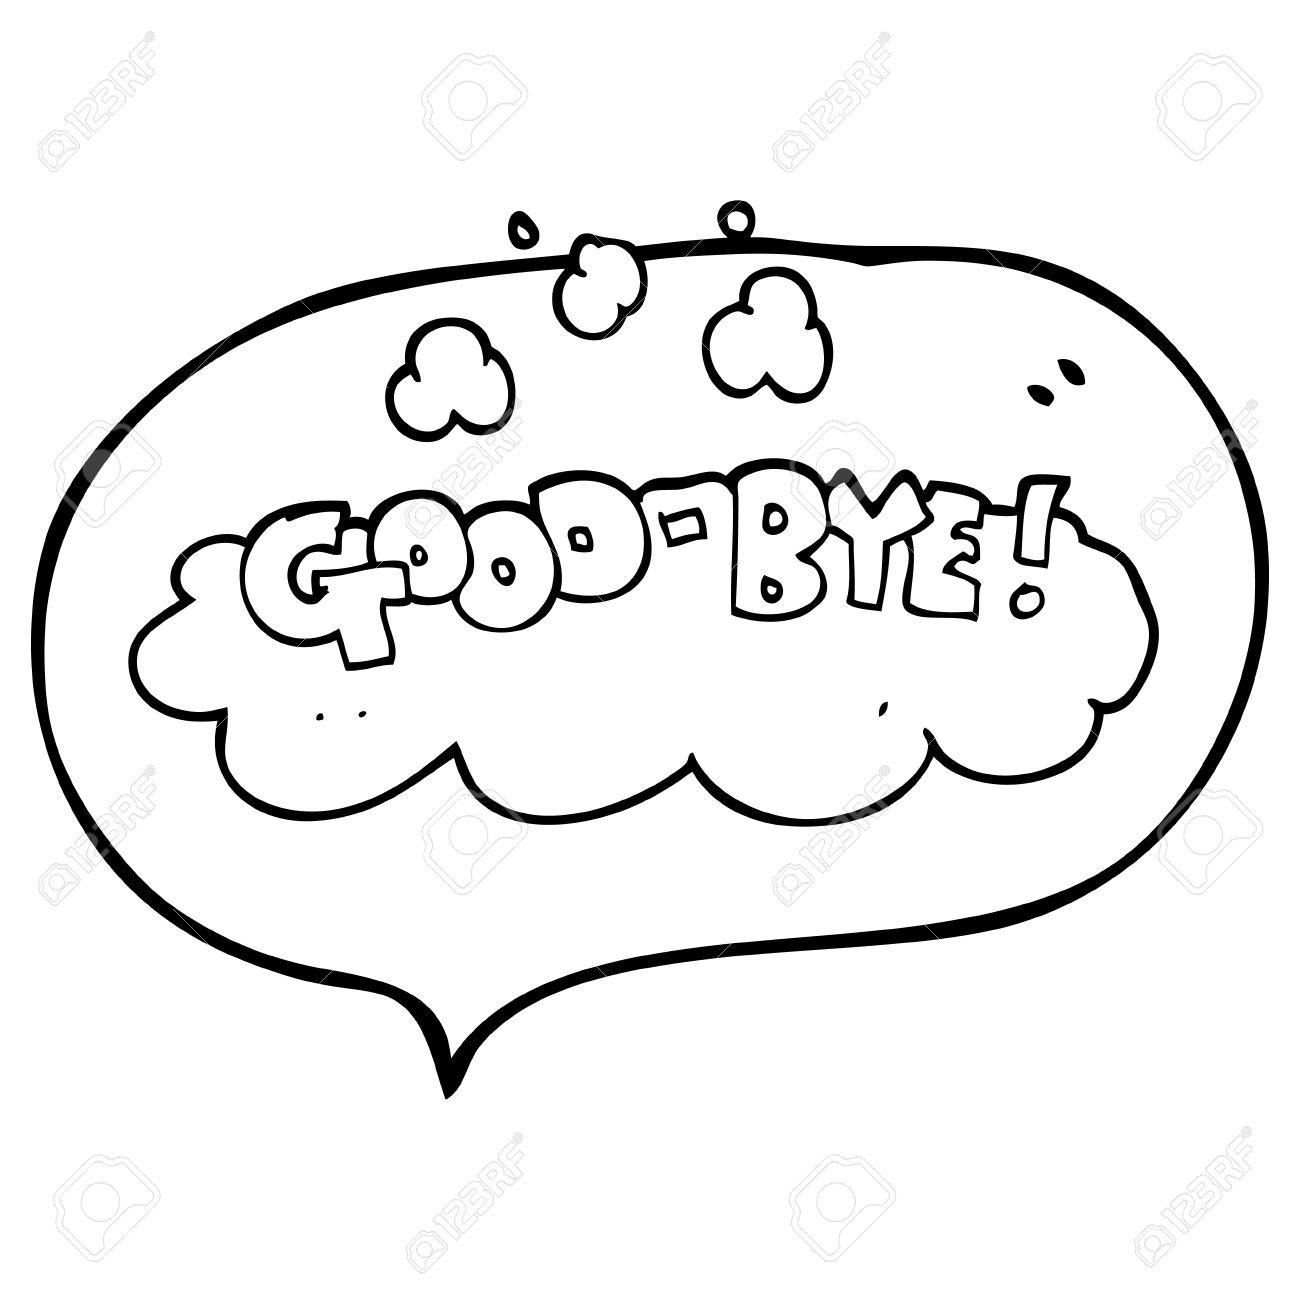 1300x1300 Freehand Drawn Speech Bubble Cartoon Good Bye Symbol Royalty Free